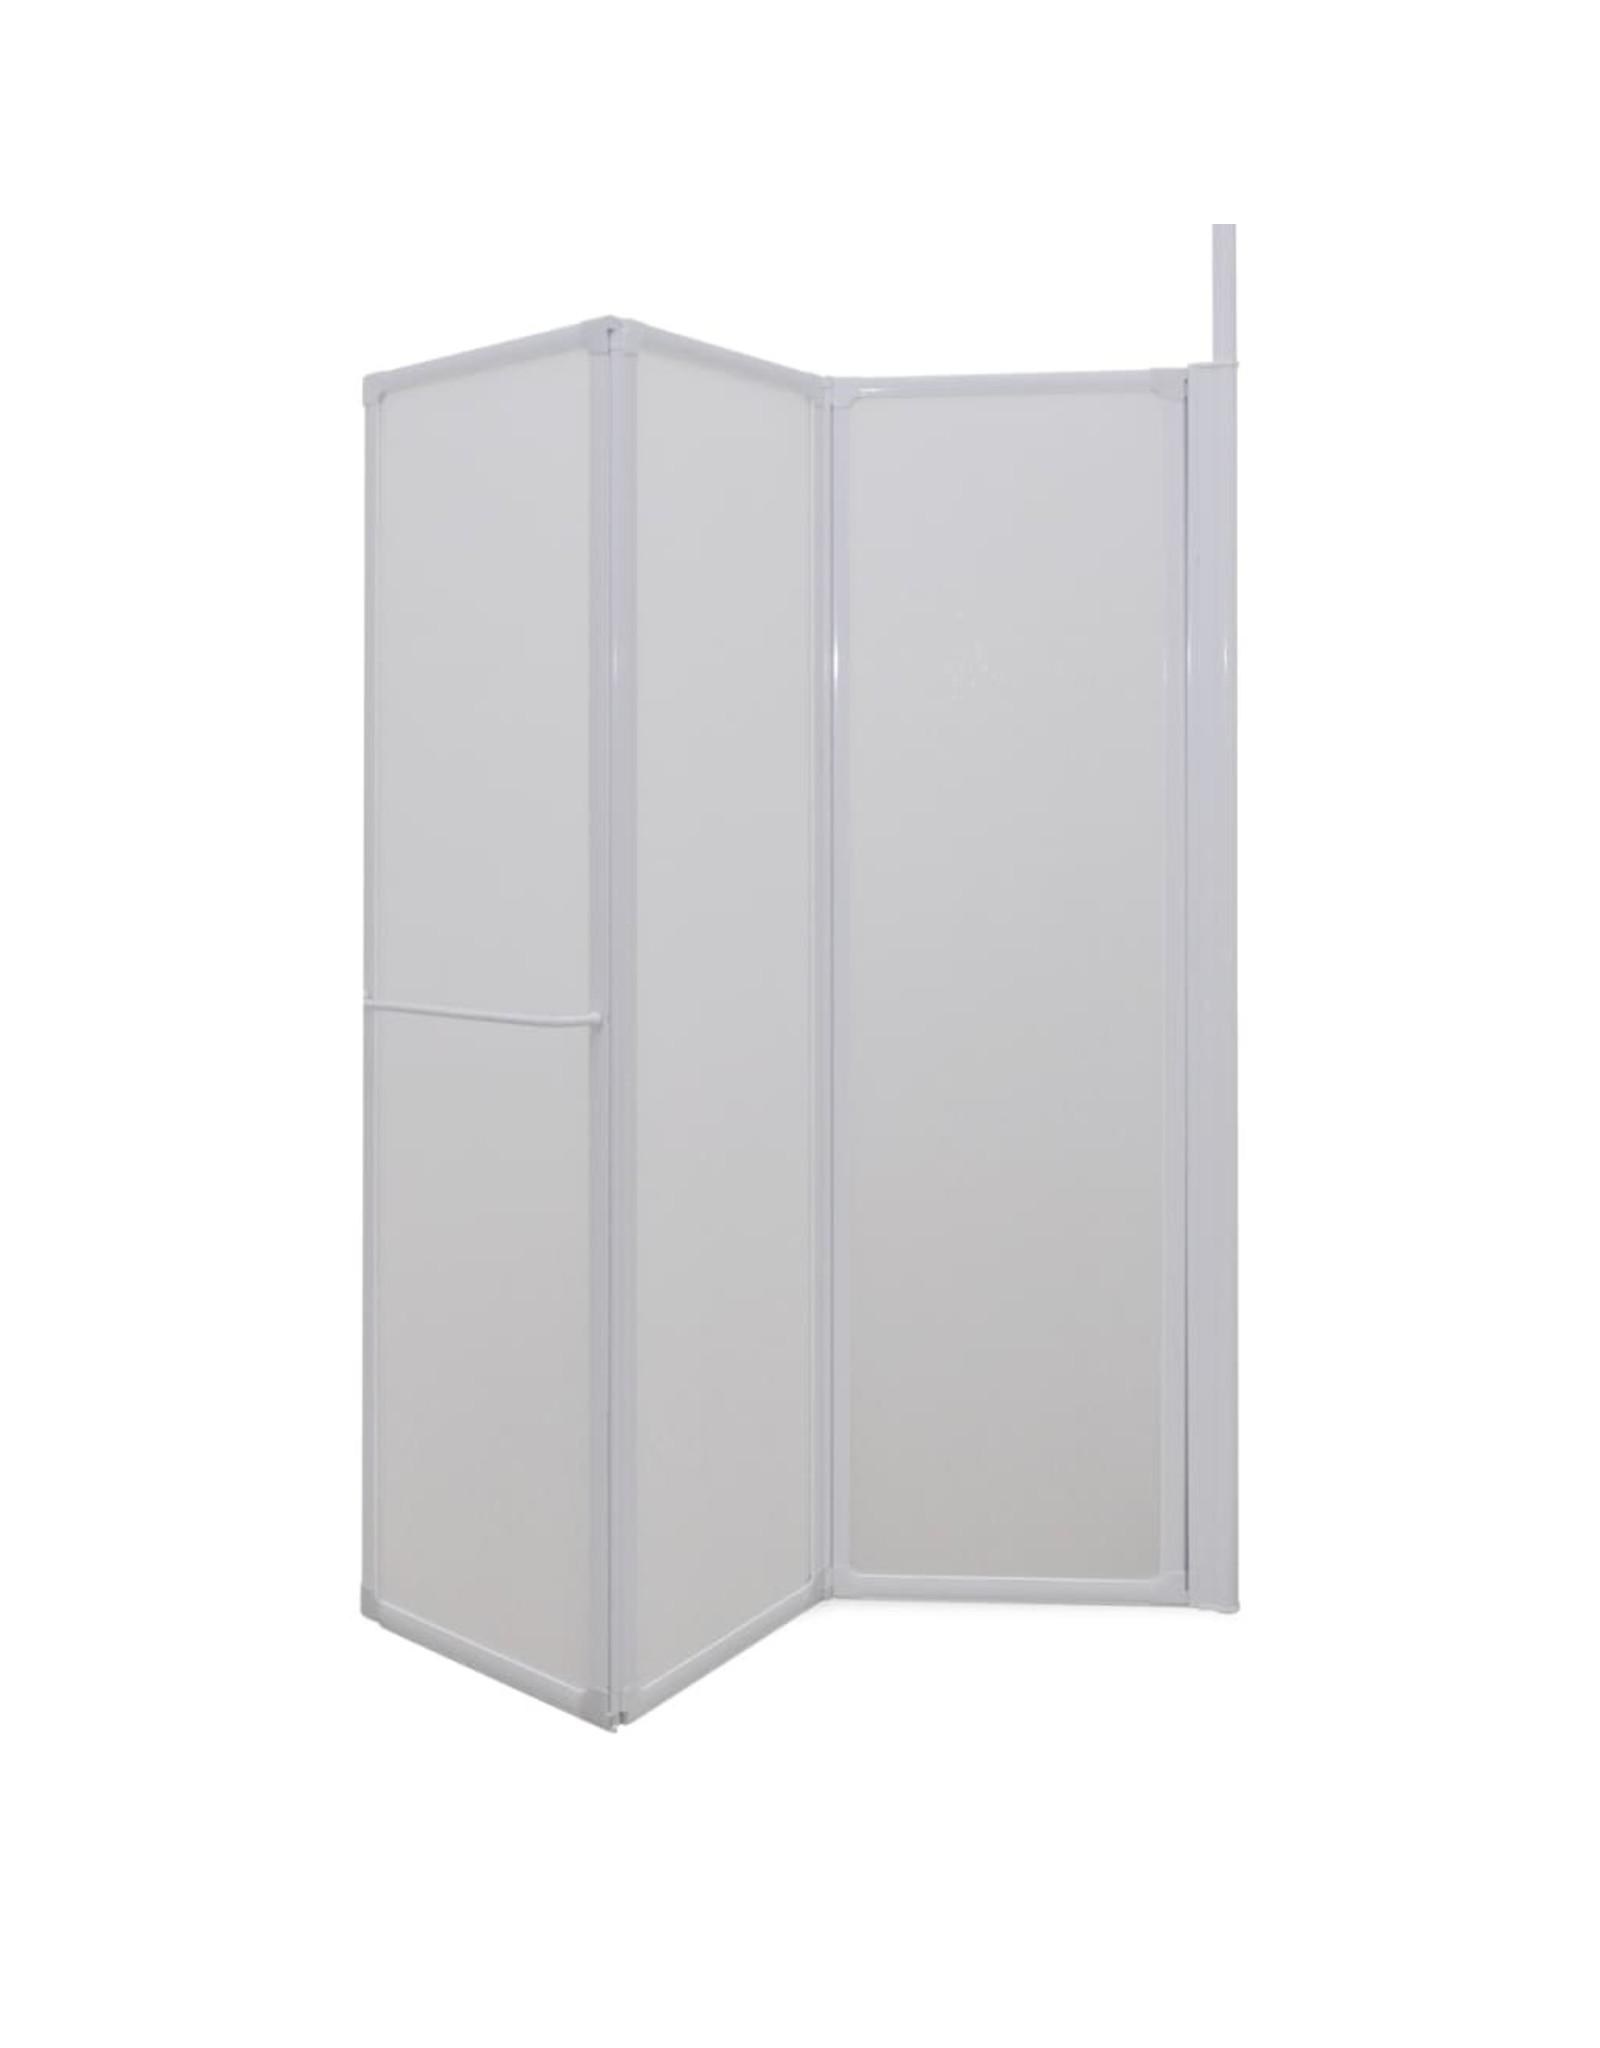 Douche-/badwand L-vormig 4 panelen 120x70x137 cm